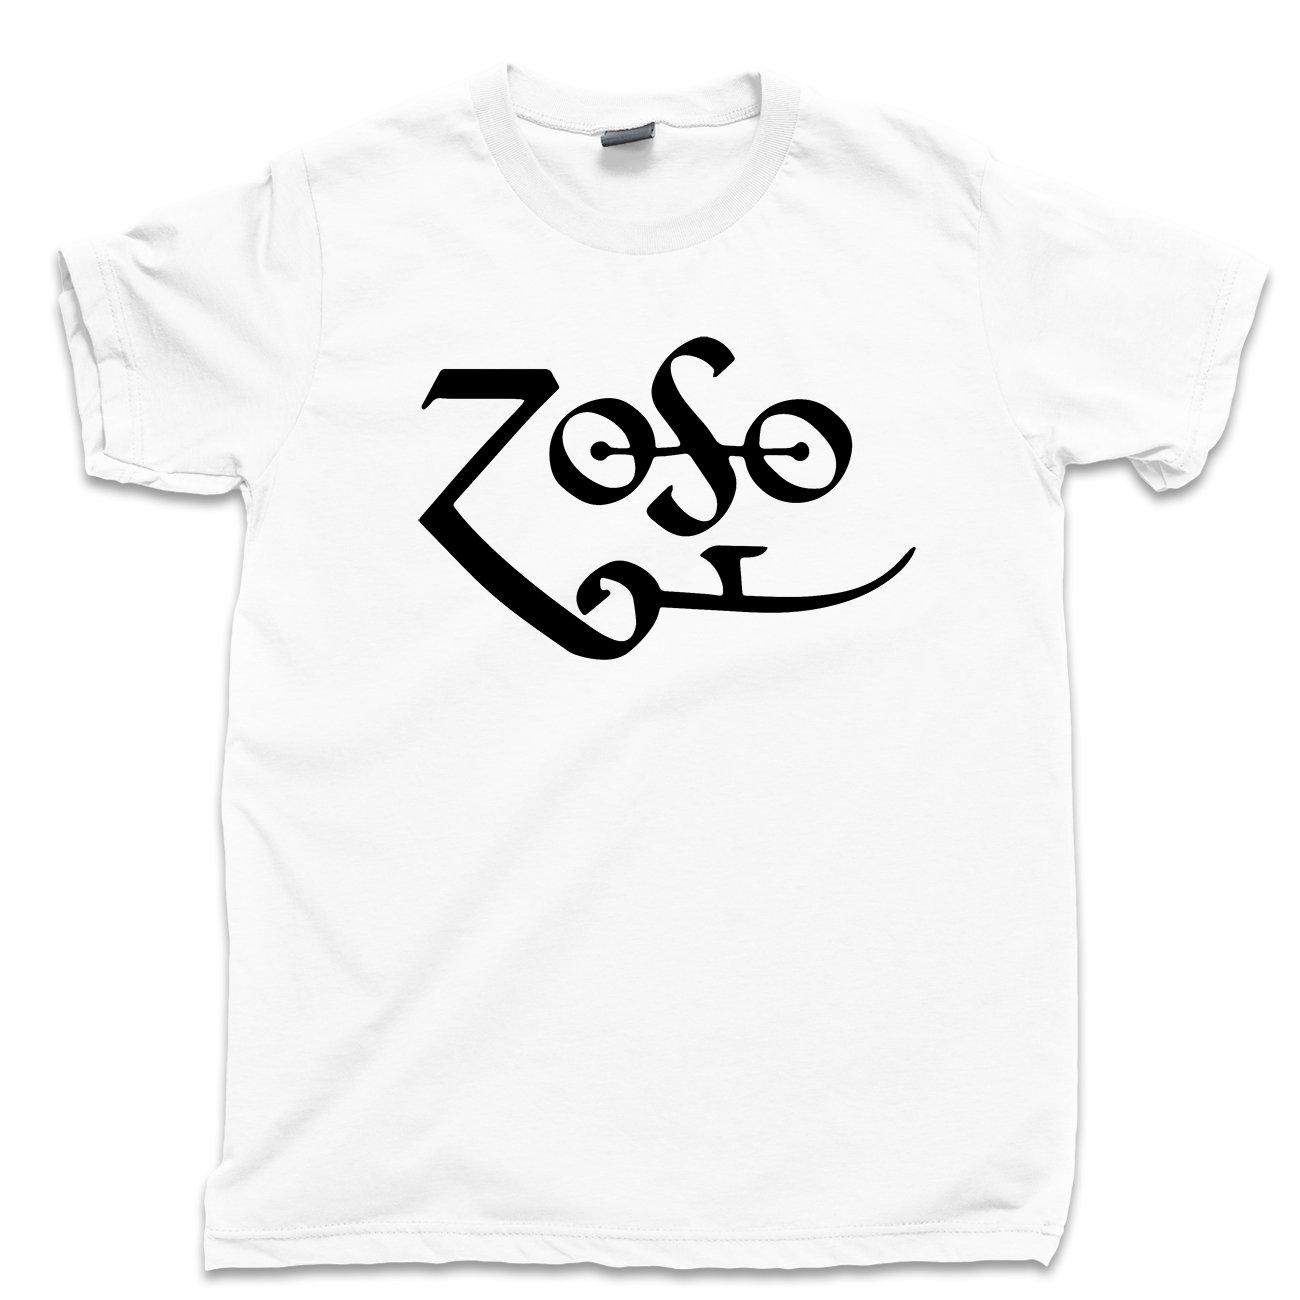 Jimmy page zoso t shirt led zeppelin 4 symbols gibson les paul description jimmy page zoso t shirt biocorpaavc Gallery